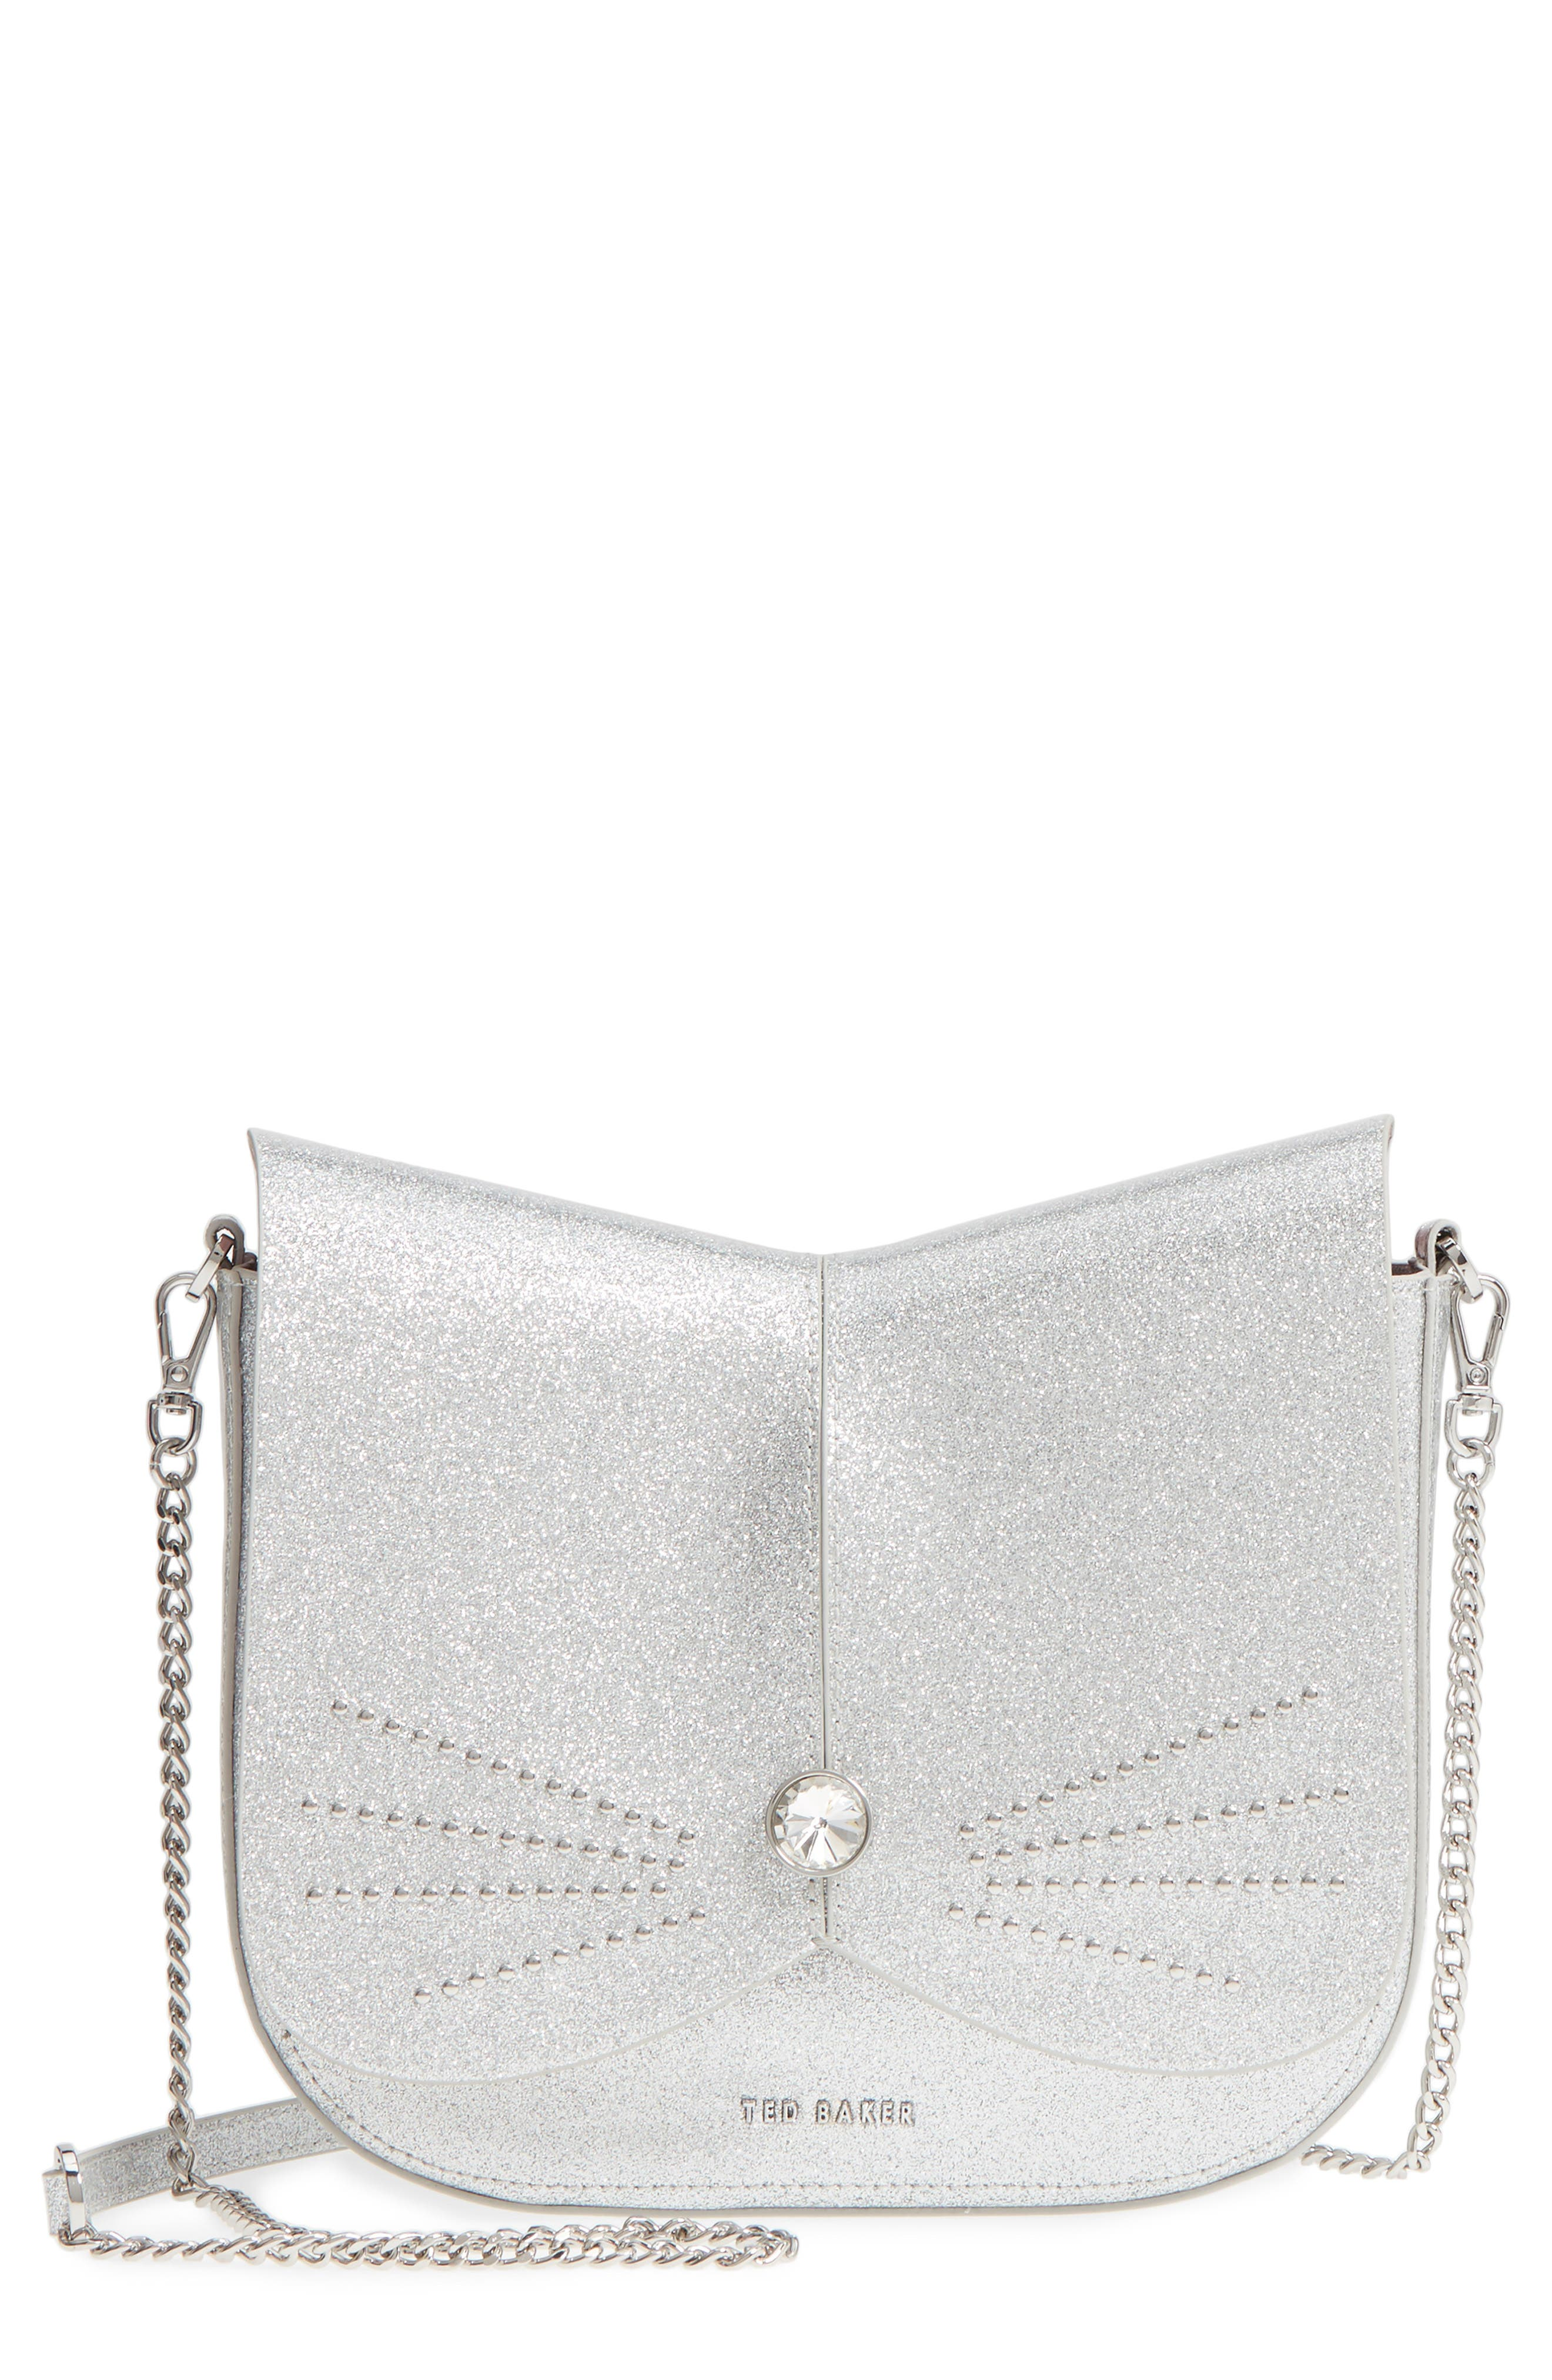 Hildaa Glitter Faux Leather Crossbody Bag,                             Main thumbnail 1, color,                             040